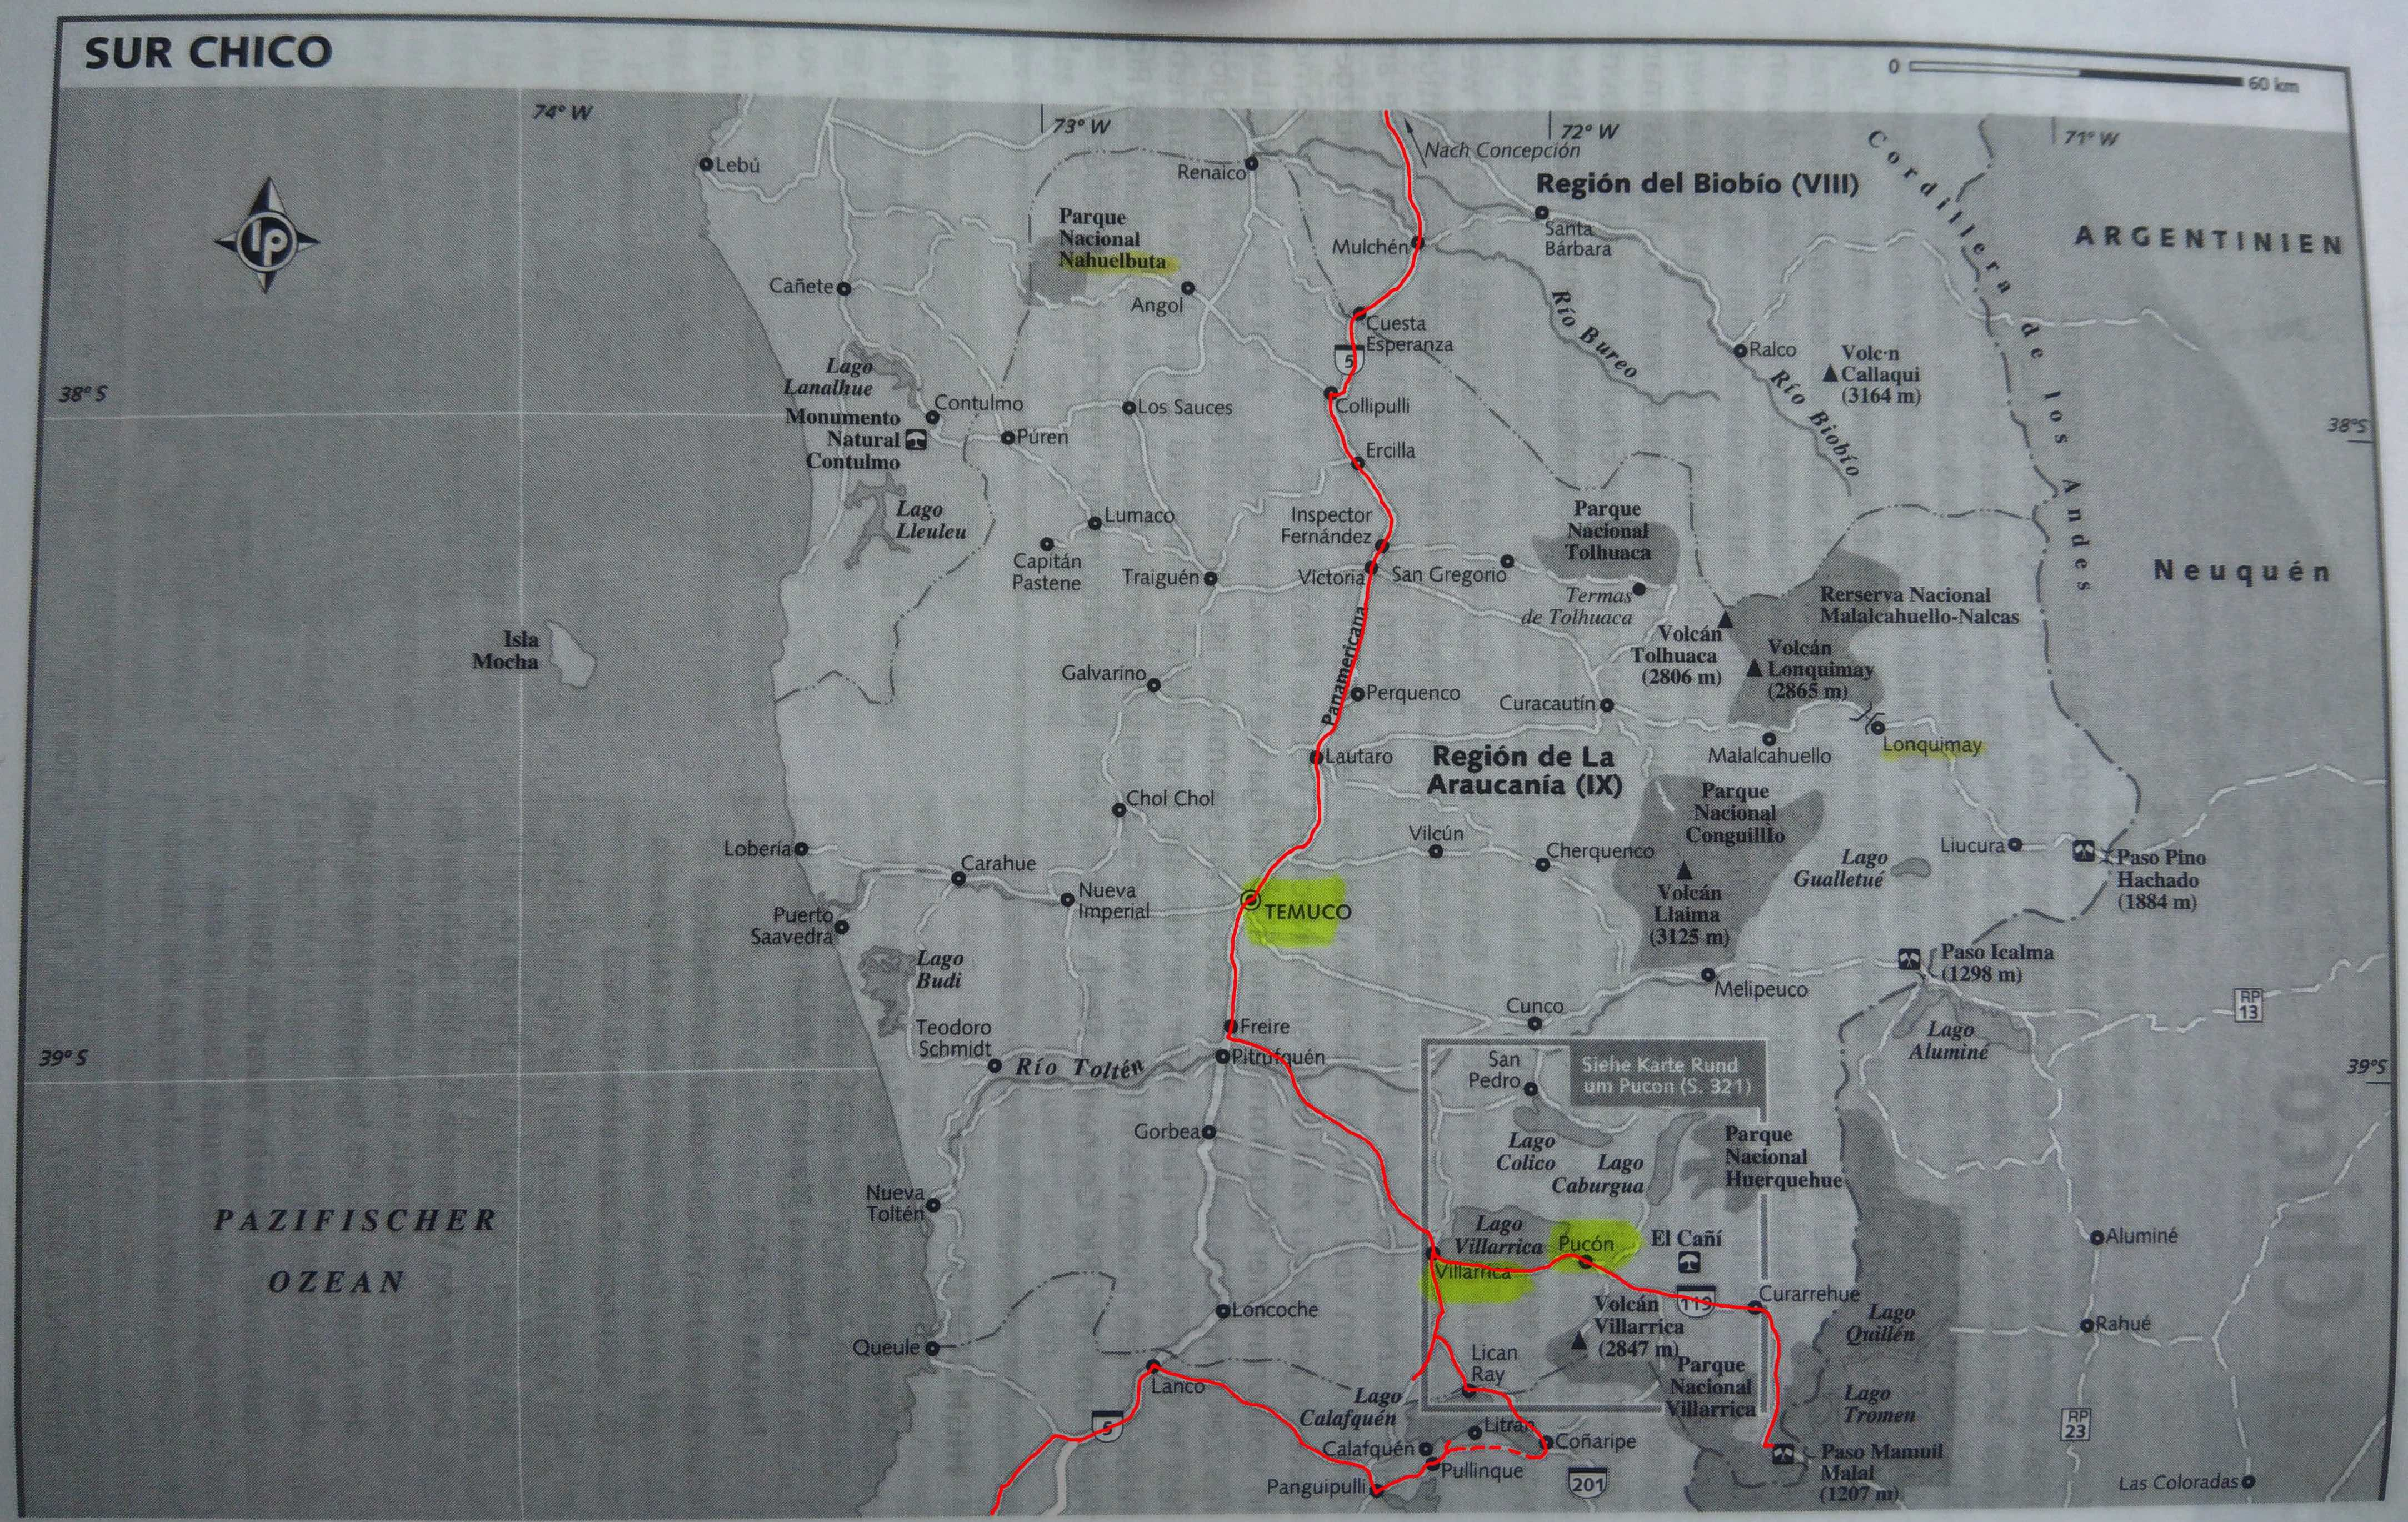 020 Route Sur Chico - Karte northjpg